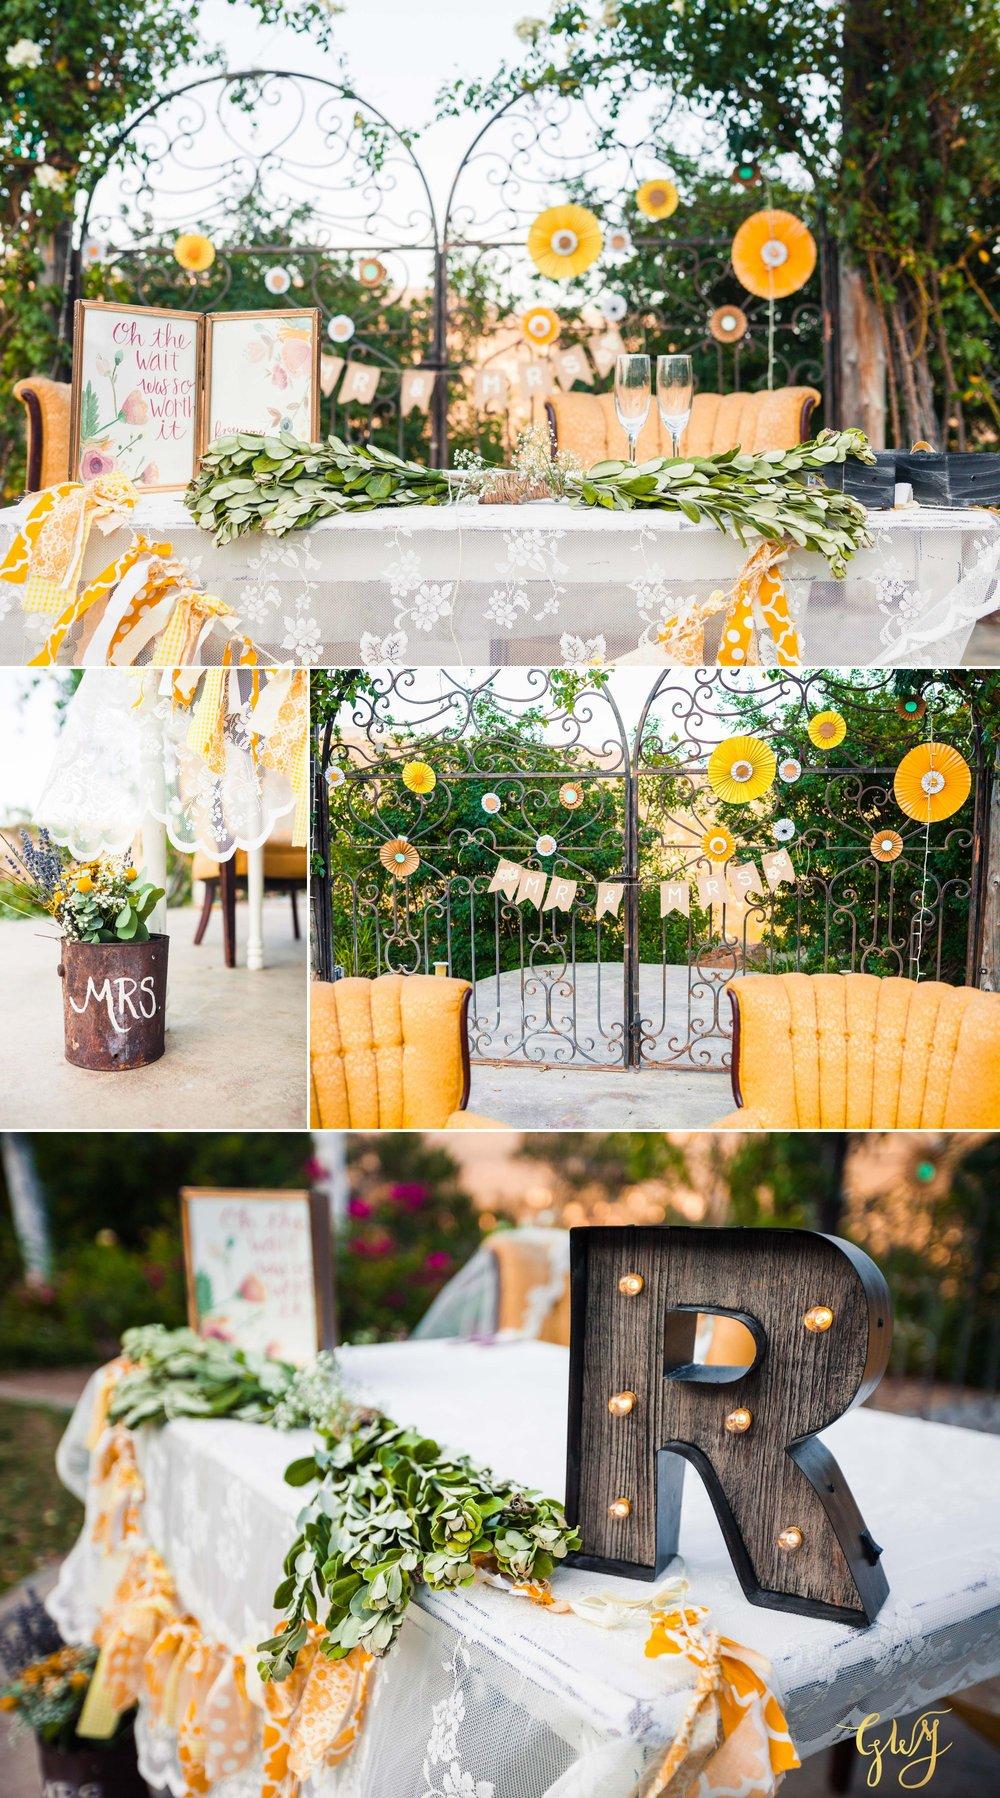 Hannah + Lorenzo Secluded Garden Estate Temecula DIY Wedding by Glass Woods Media 24.jpg